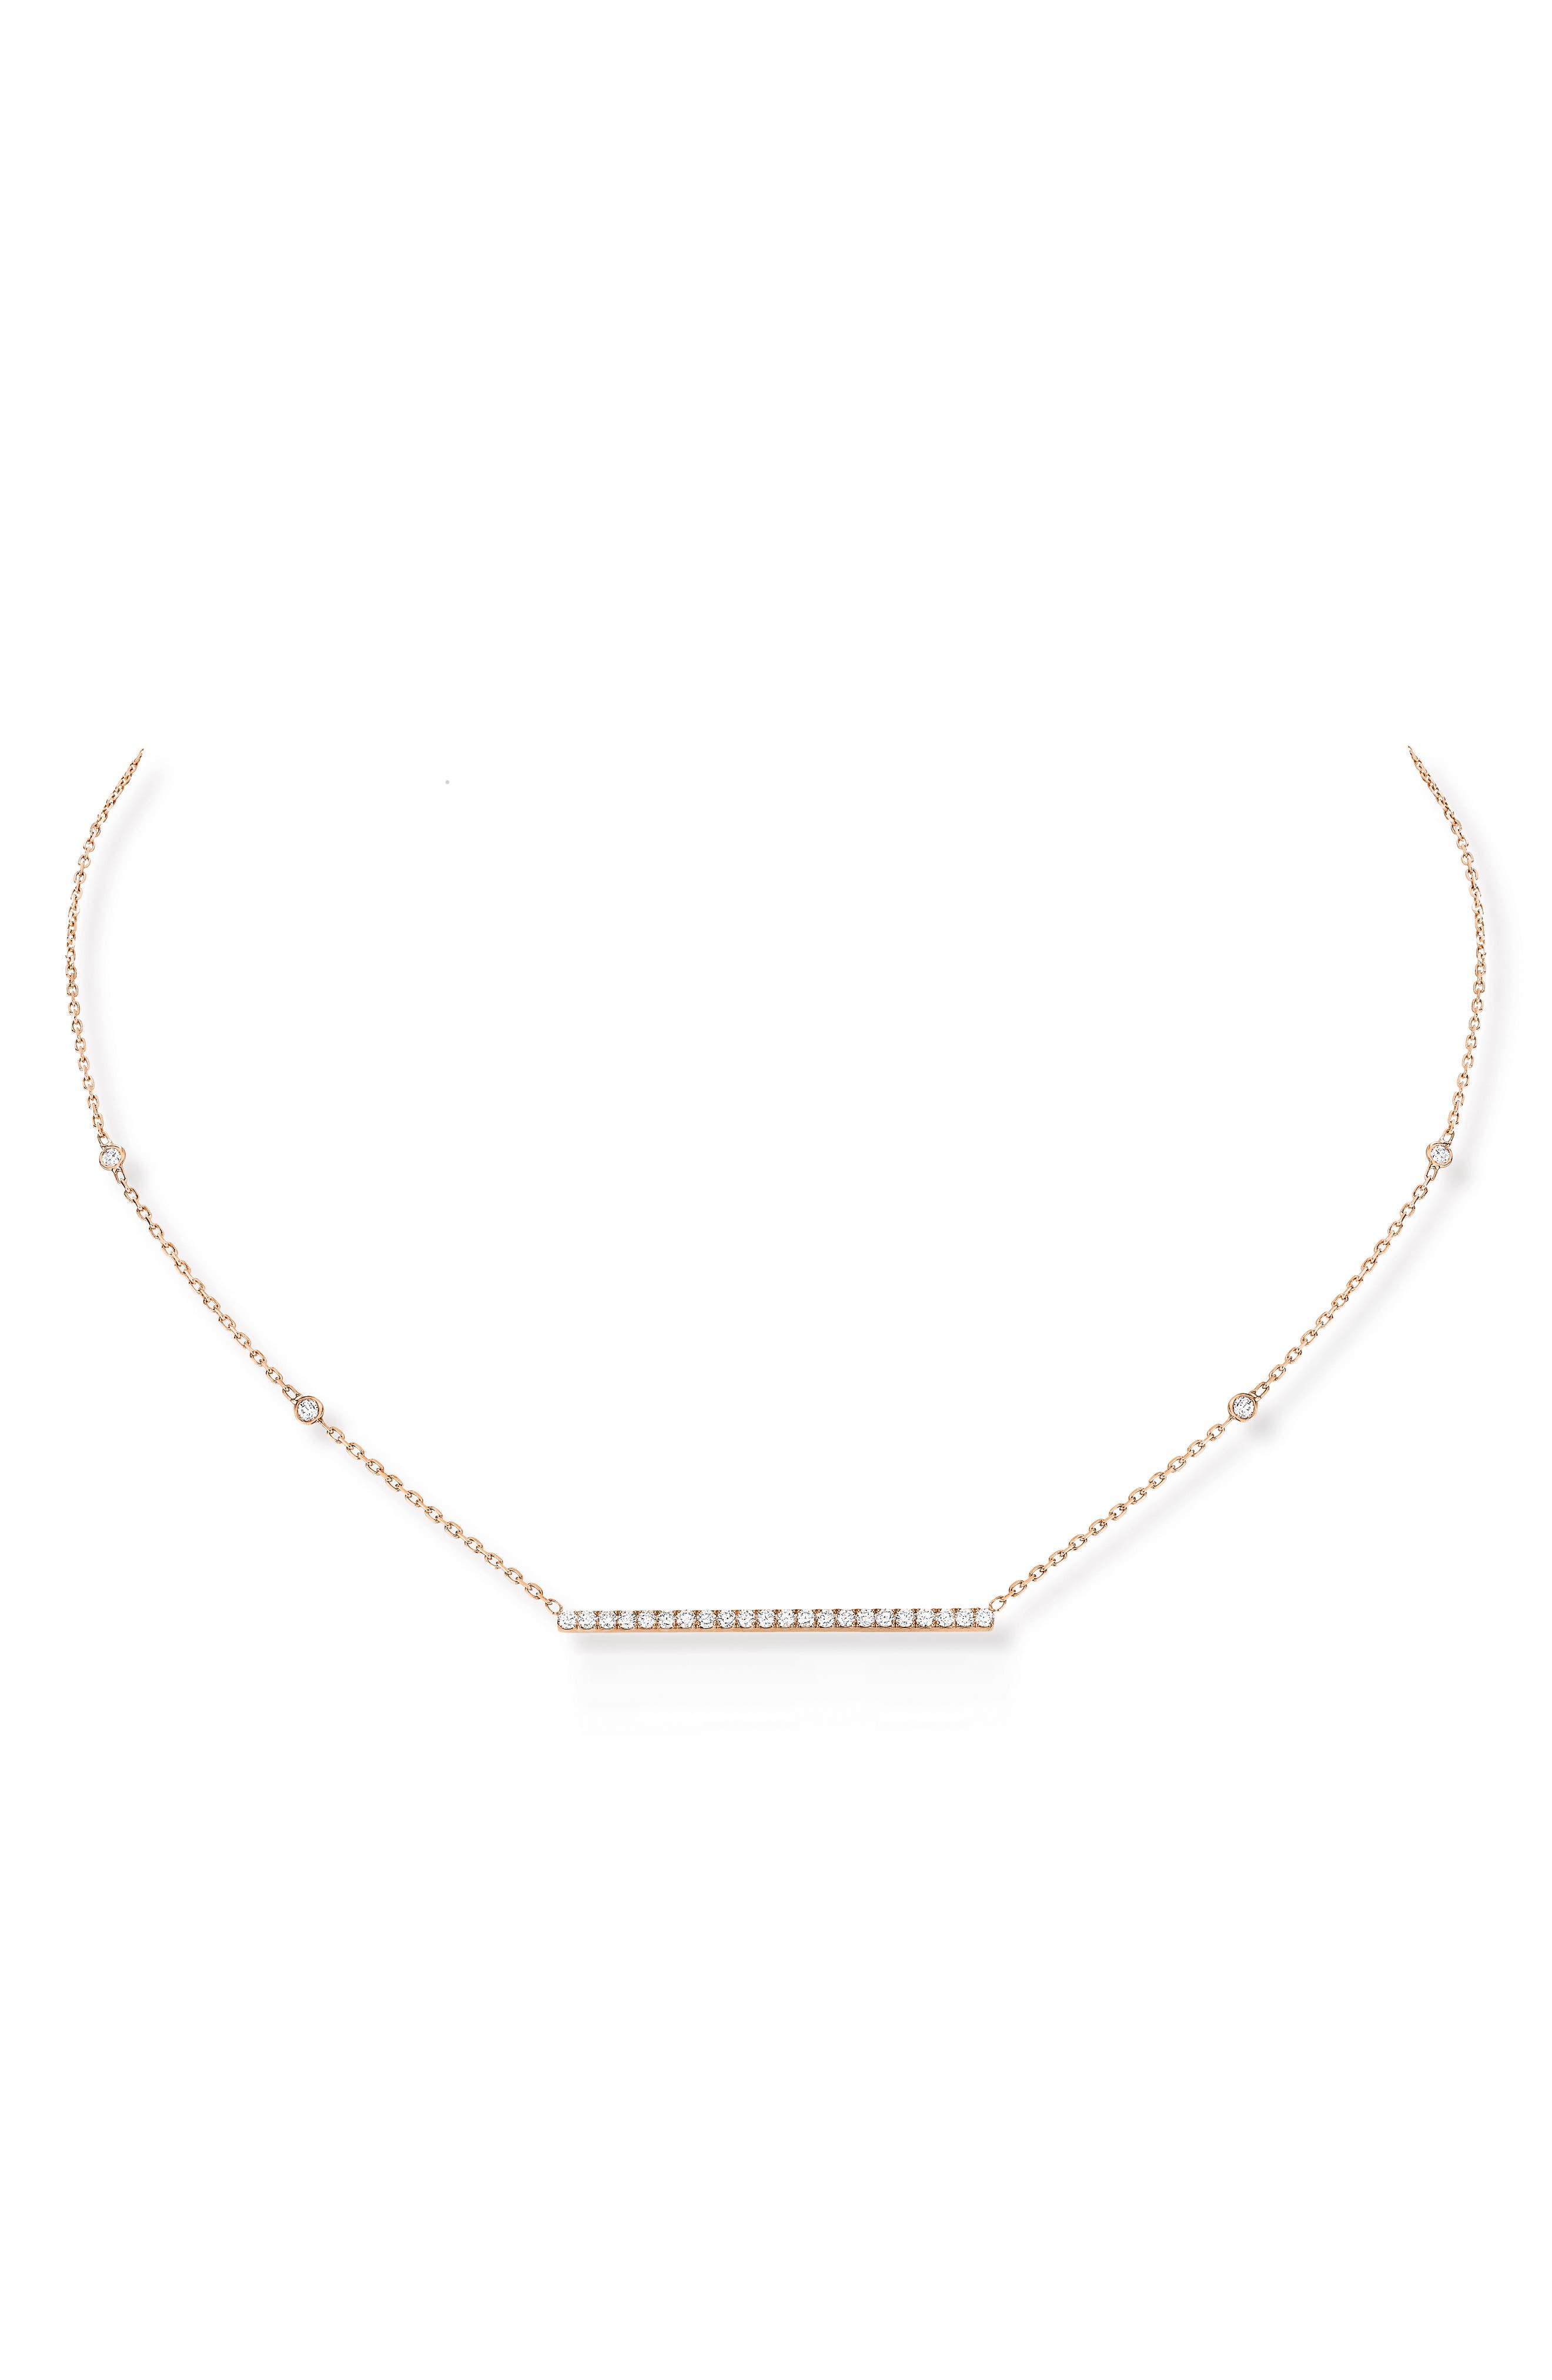 Gatsby Diamond Bar Necklace,                         Main,                         color, ROSE GOLD